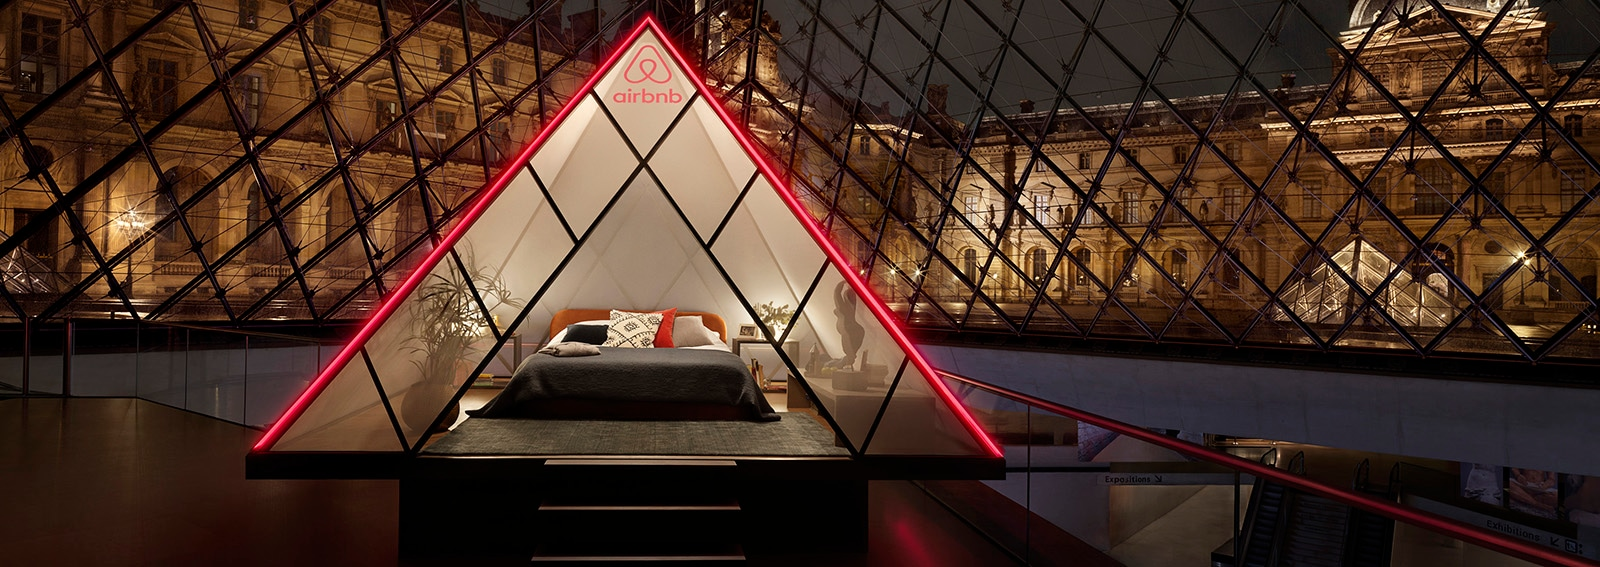 Airbnb x Louvre Julian Abrams14 parigi